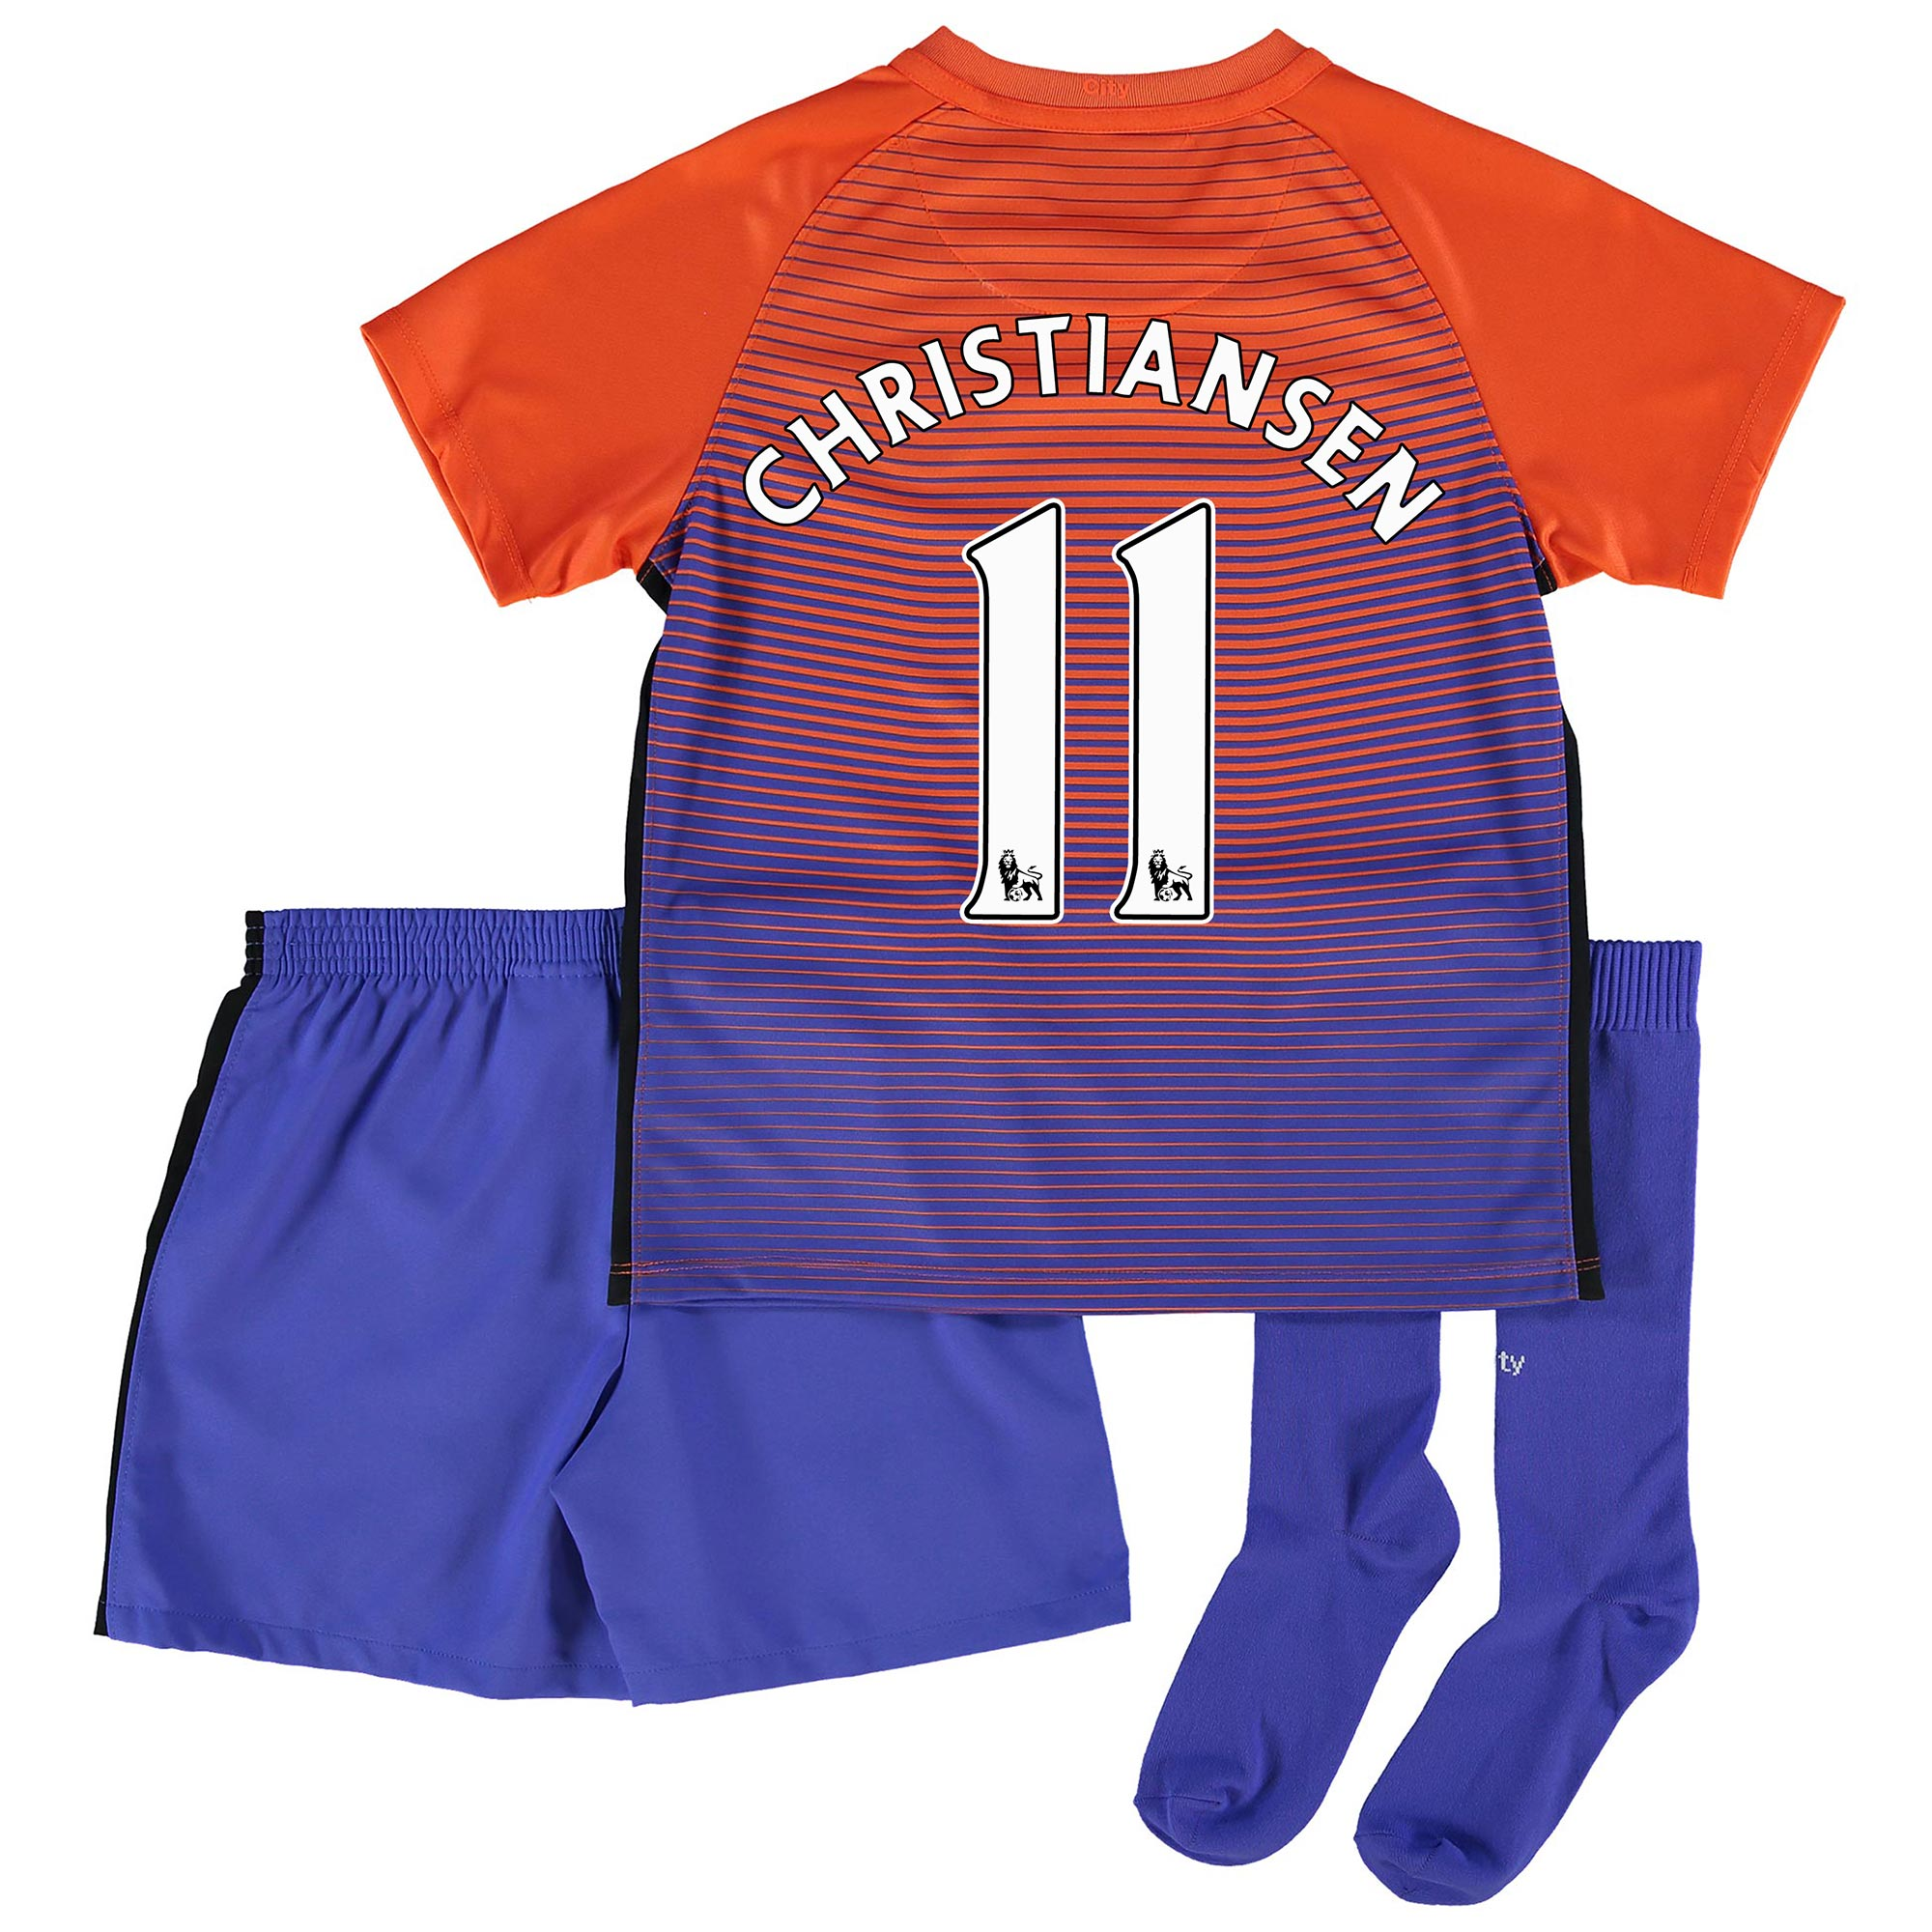 Manchester City Third Stadium Kit 2016-17 - Little Kids with Christian